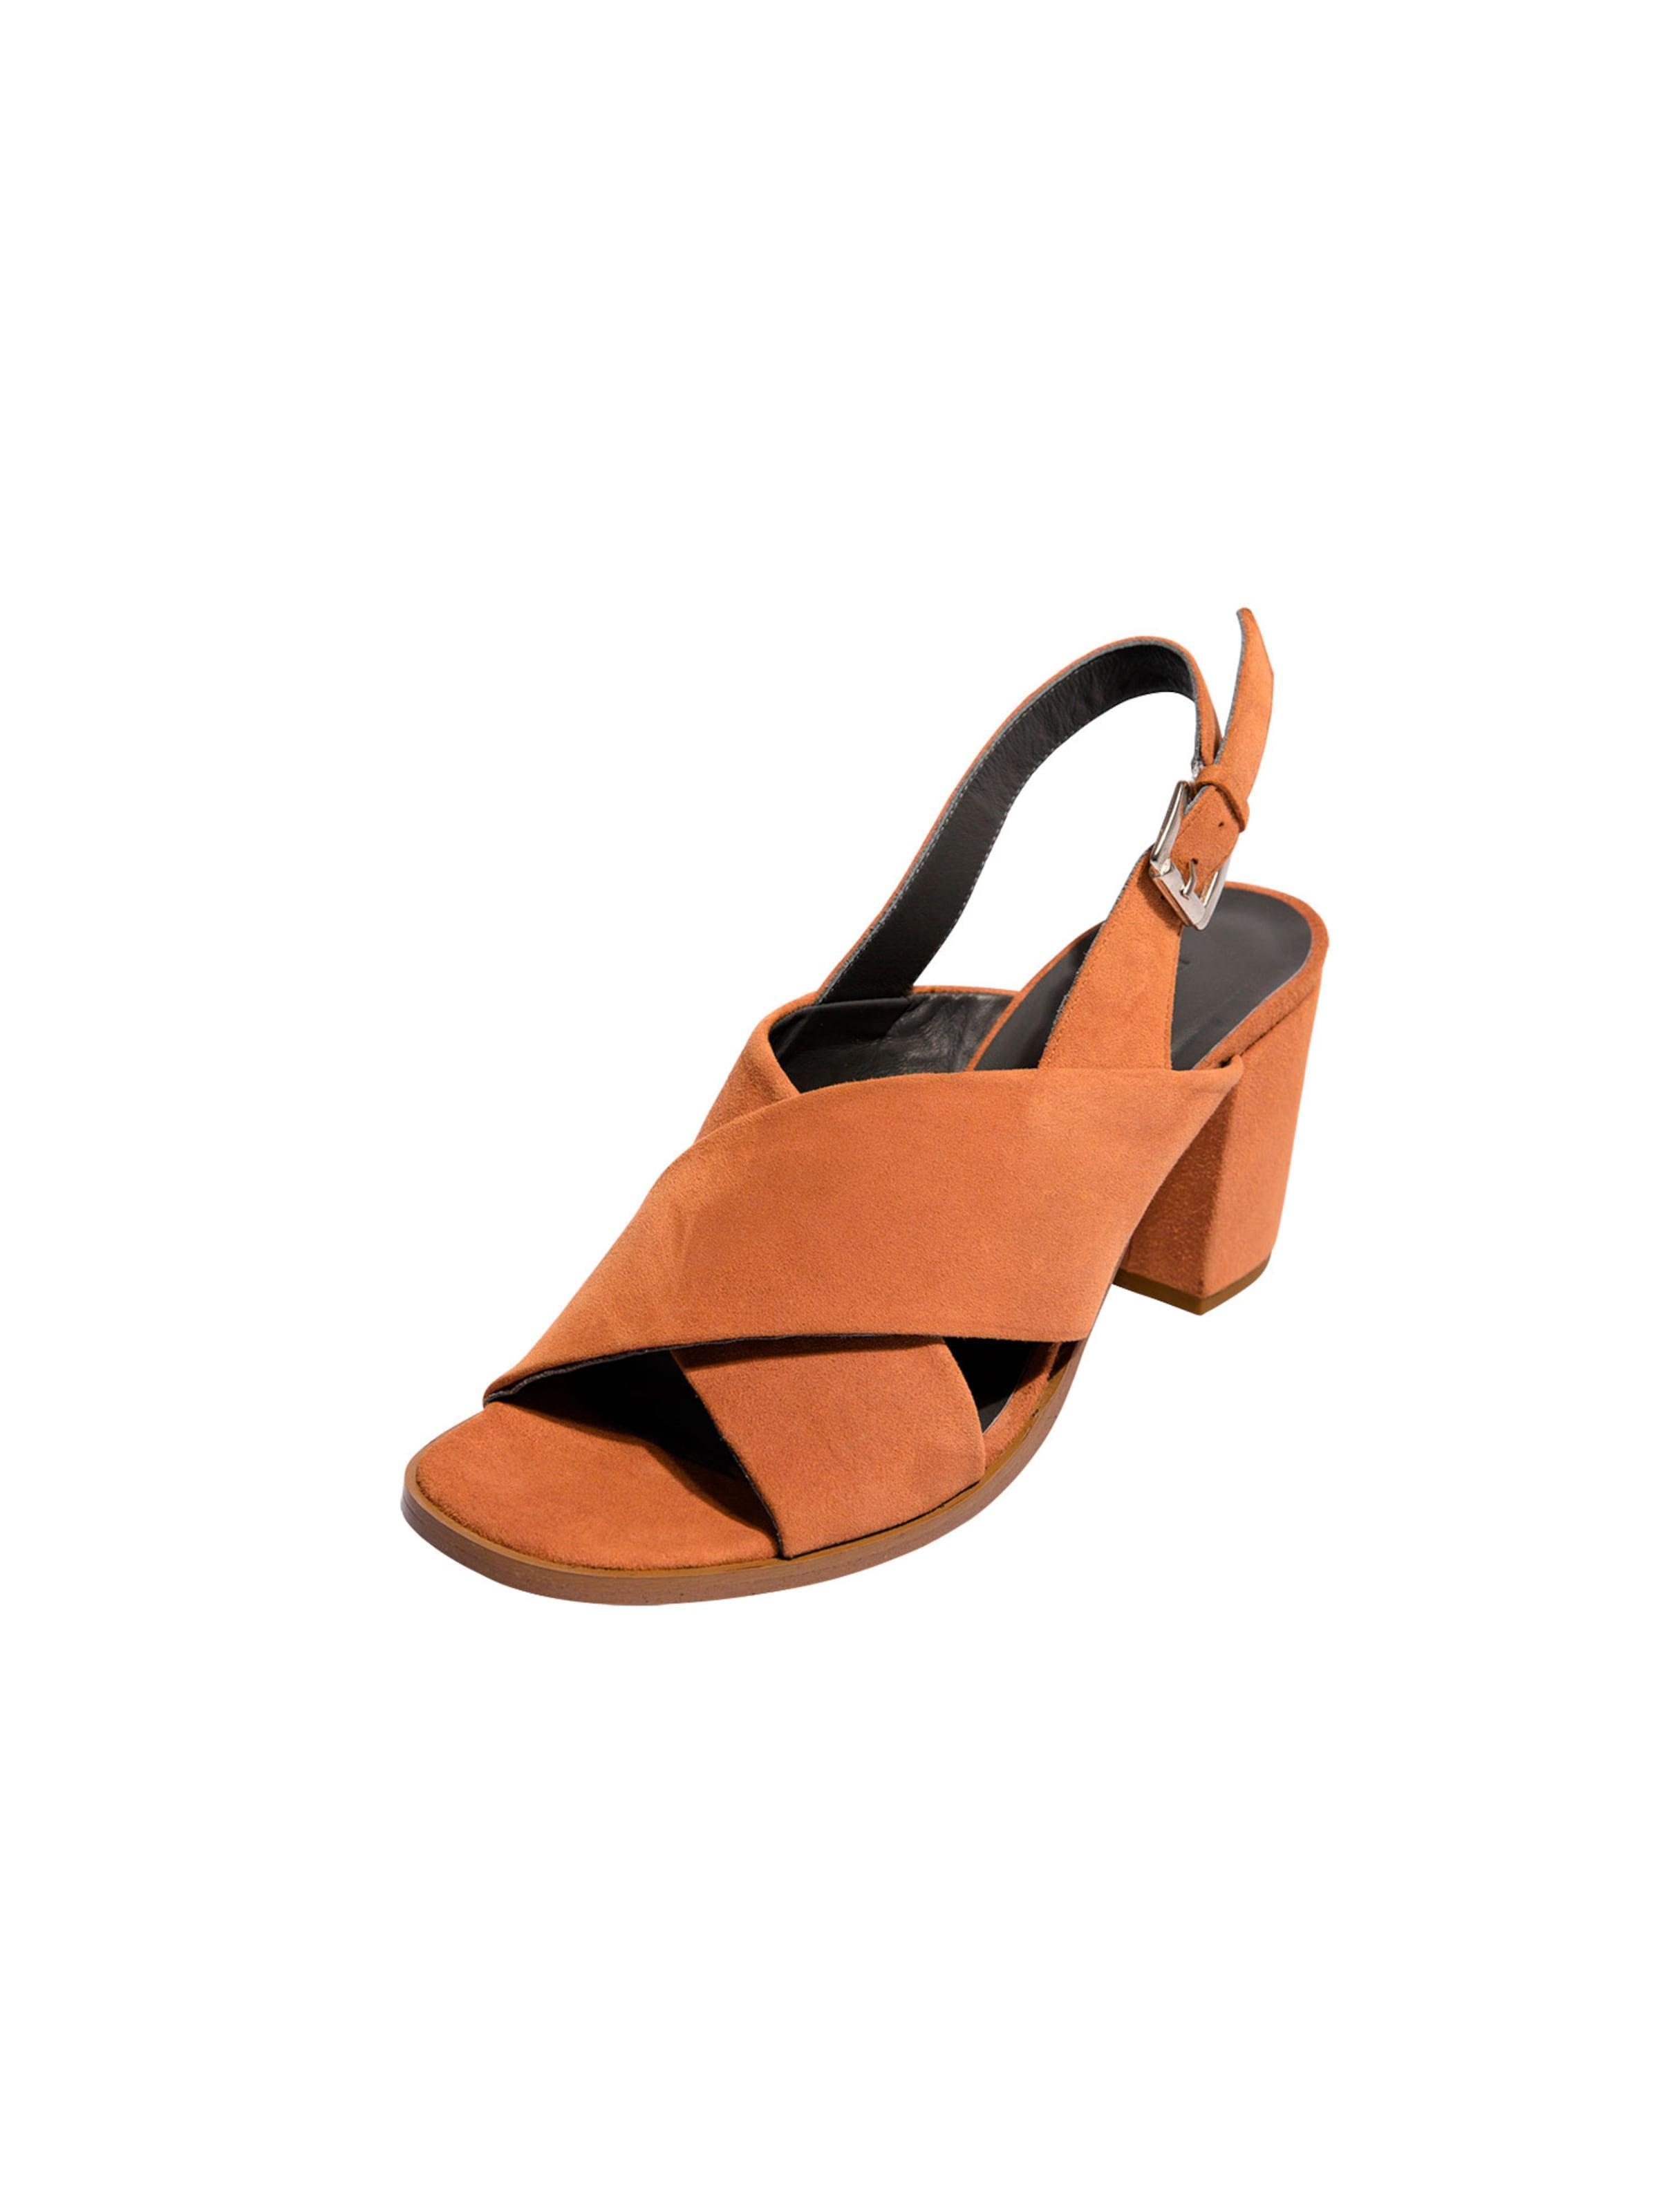 Haltbare Mode Riemchensandalen billige Schuhe EDITED | Riemchensandalen Mode 'Manda' Schuhe Gut getragene Schuhe 8e98c2